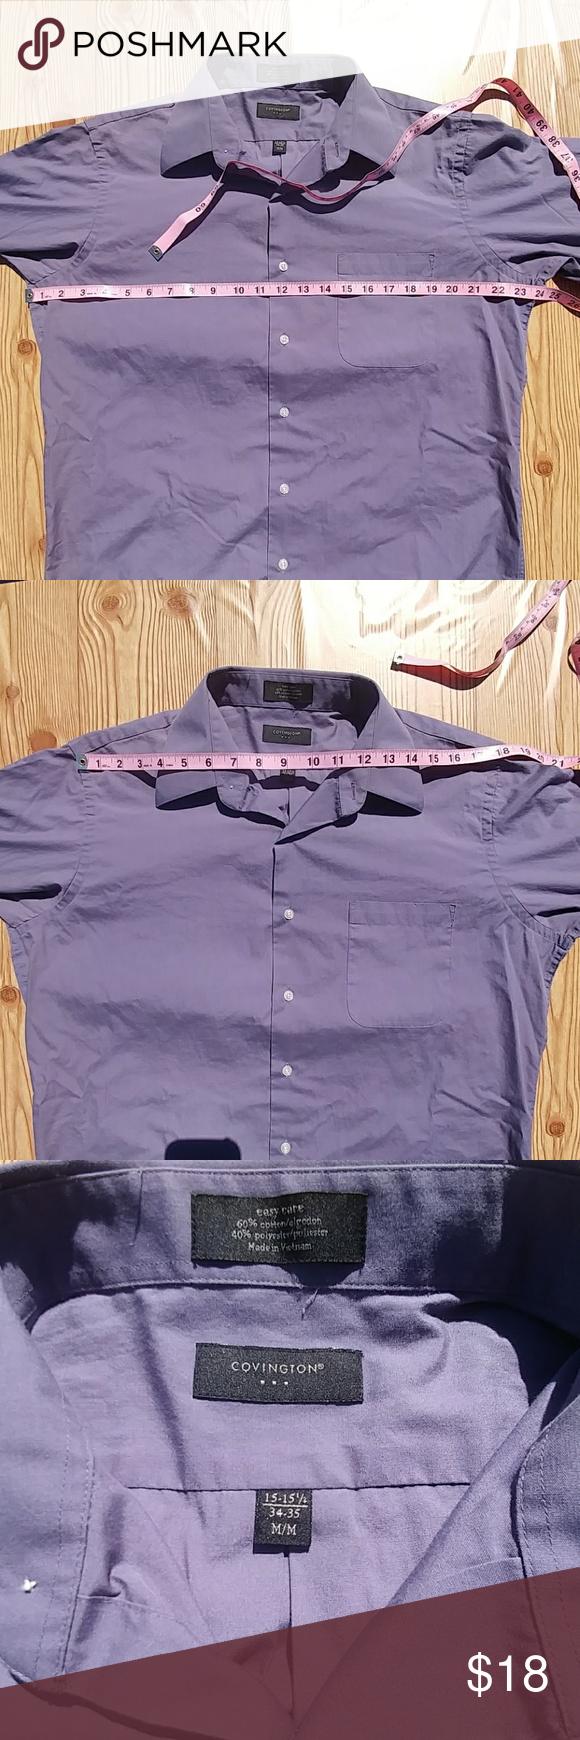 Mens Dress Shirts Size 19 1 2